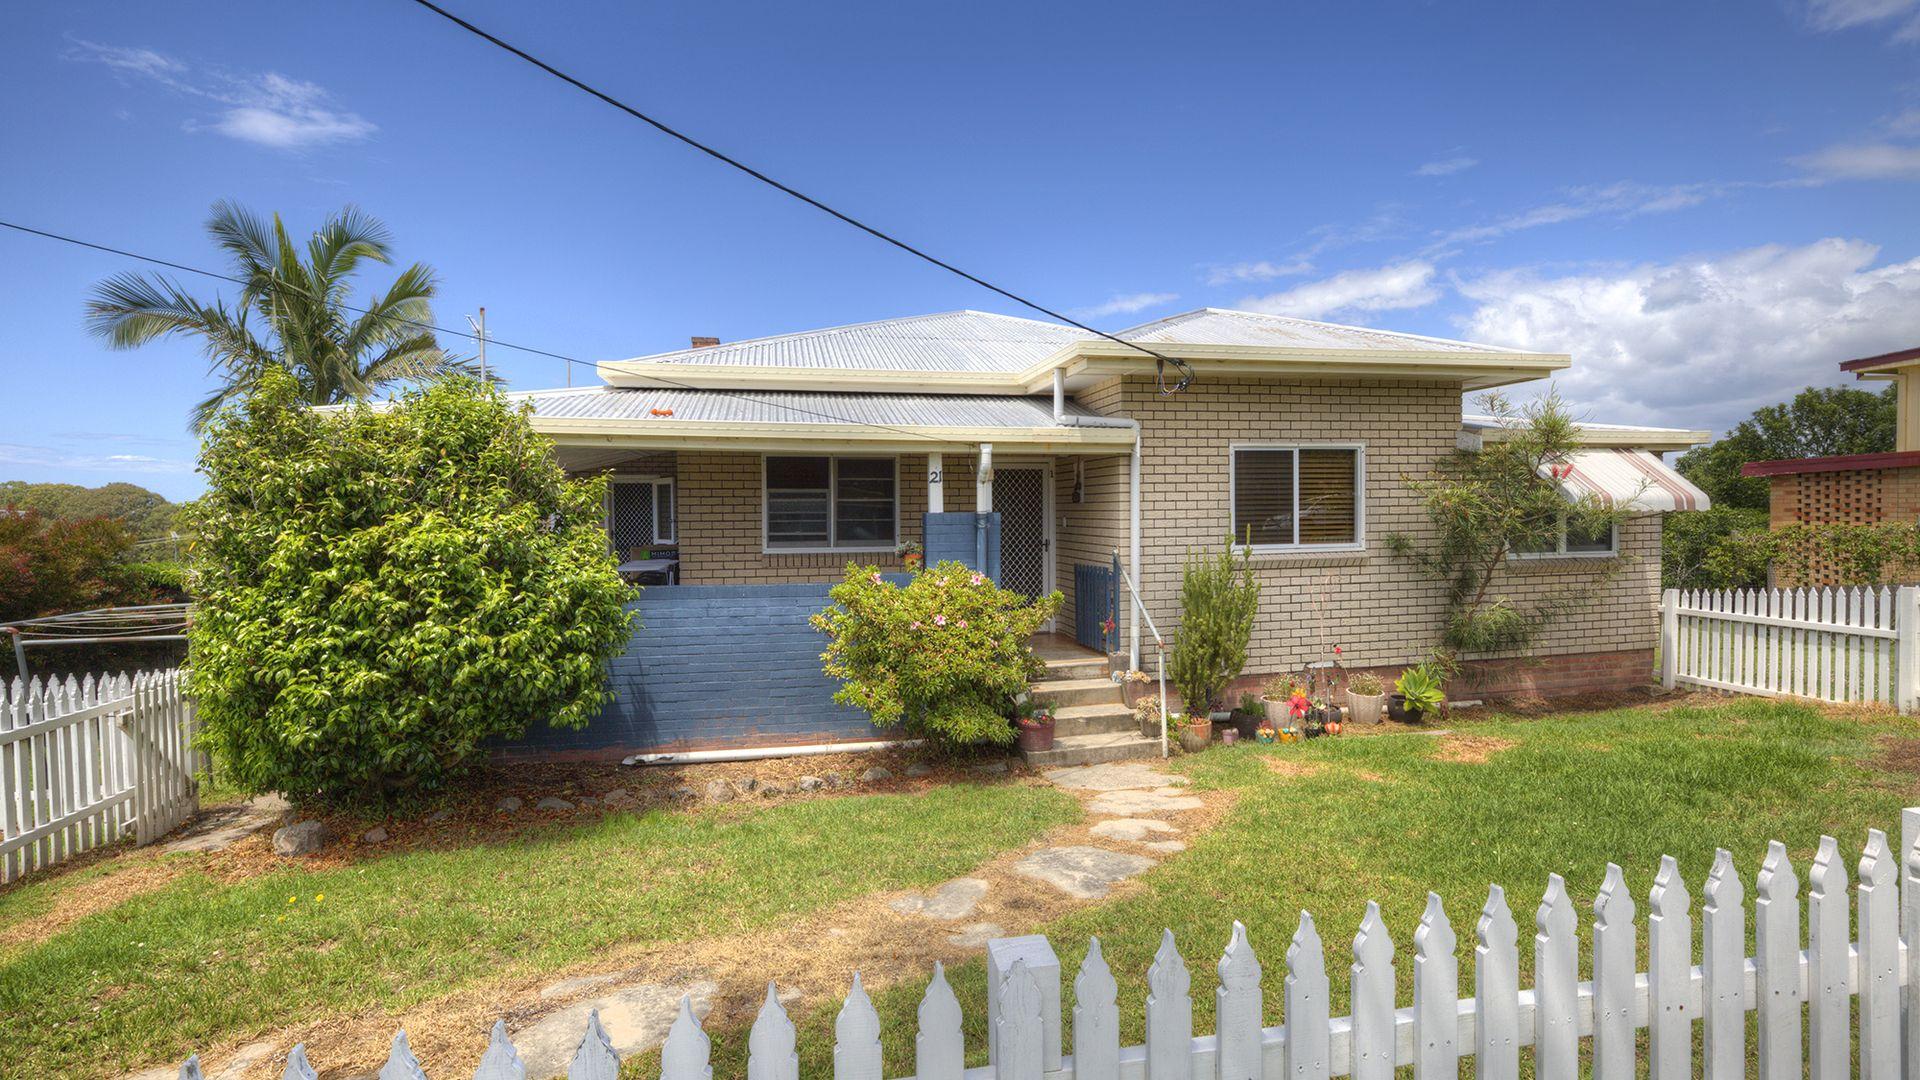 21 Seaview St, Nambucca Heads NSW 2448, Image 1